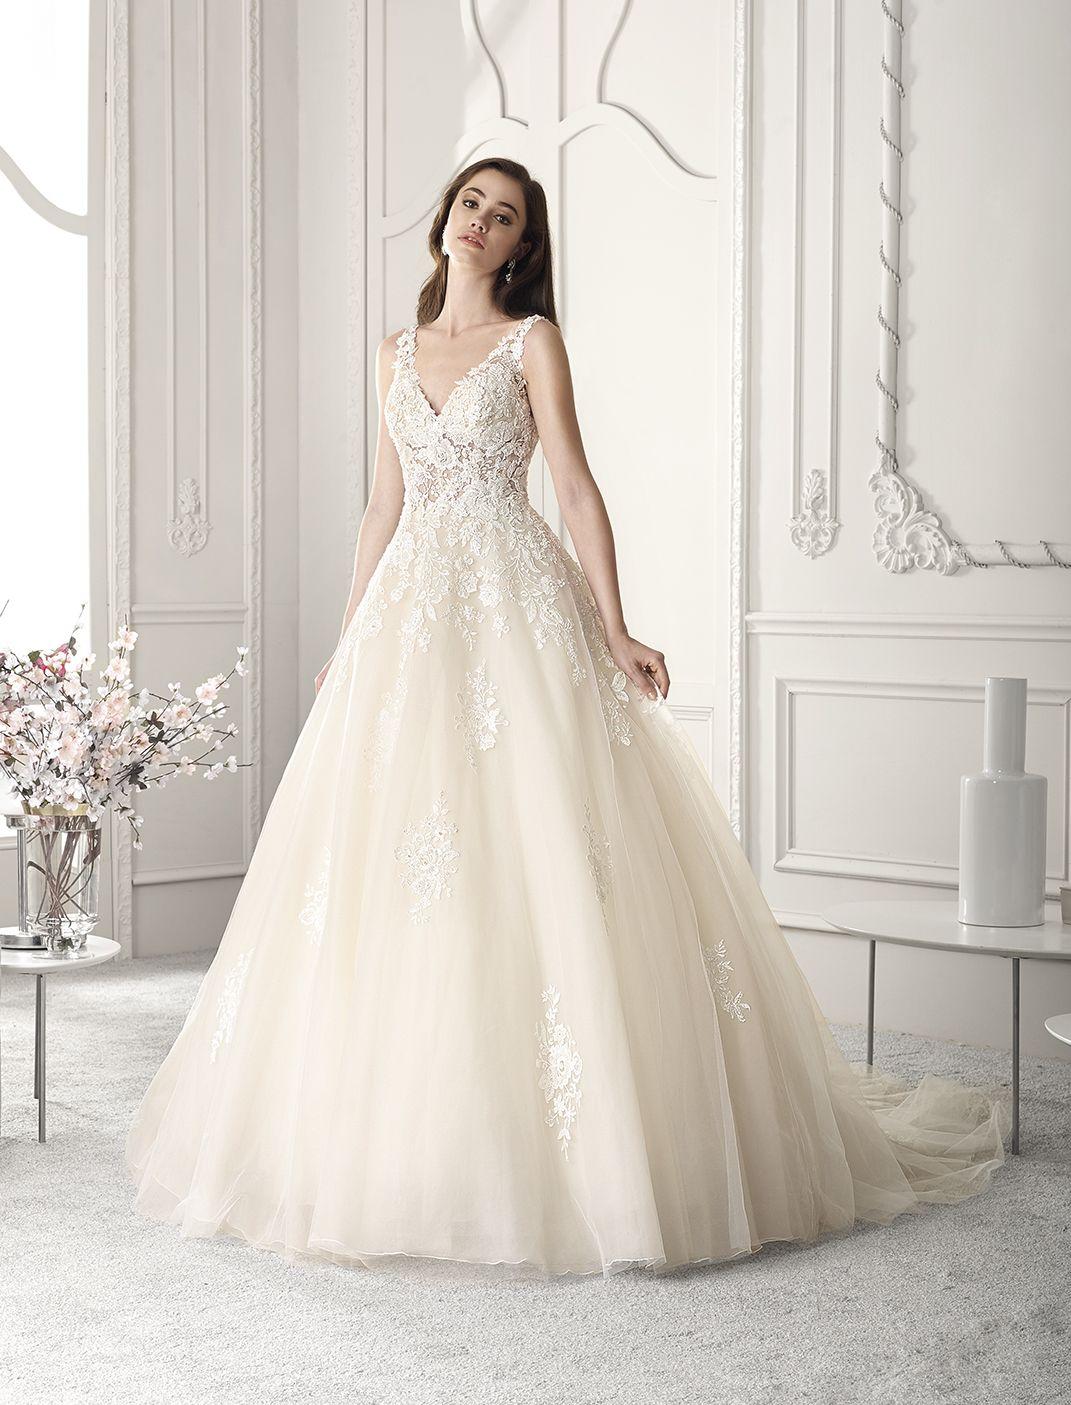 Vestidos novia corte princesa 2019